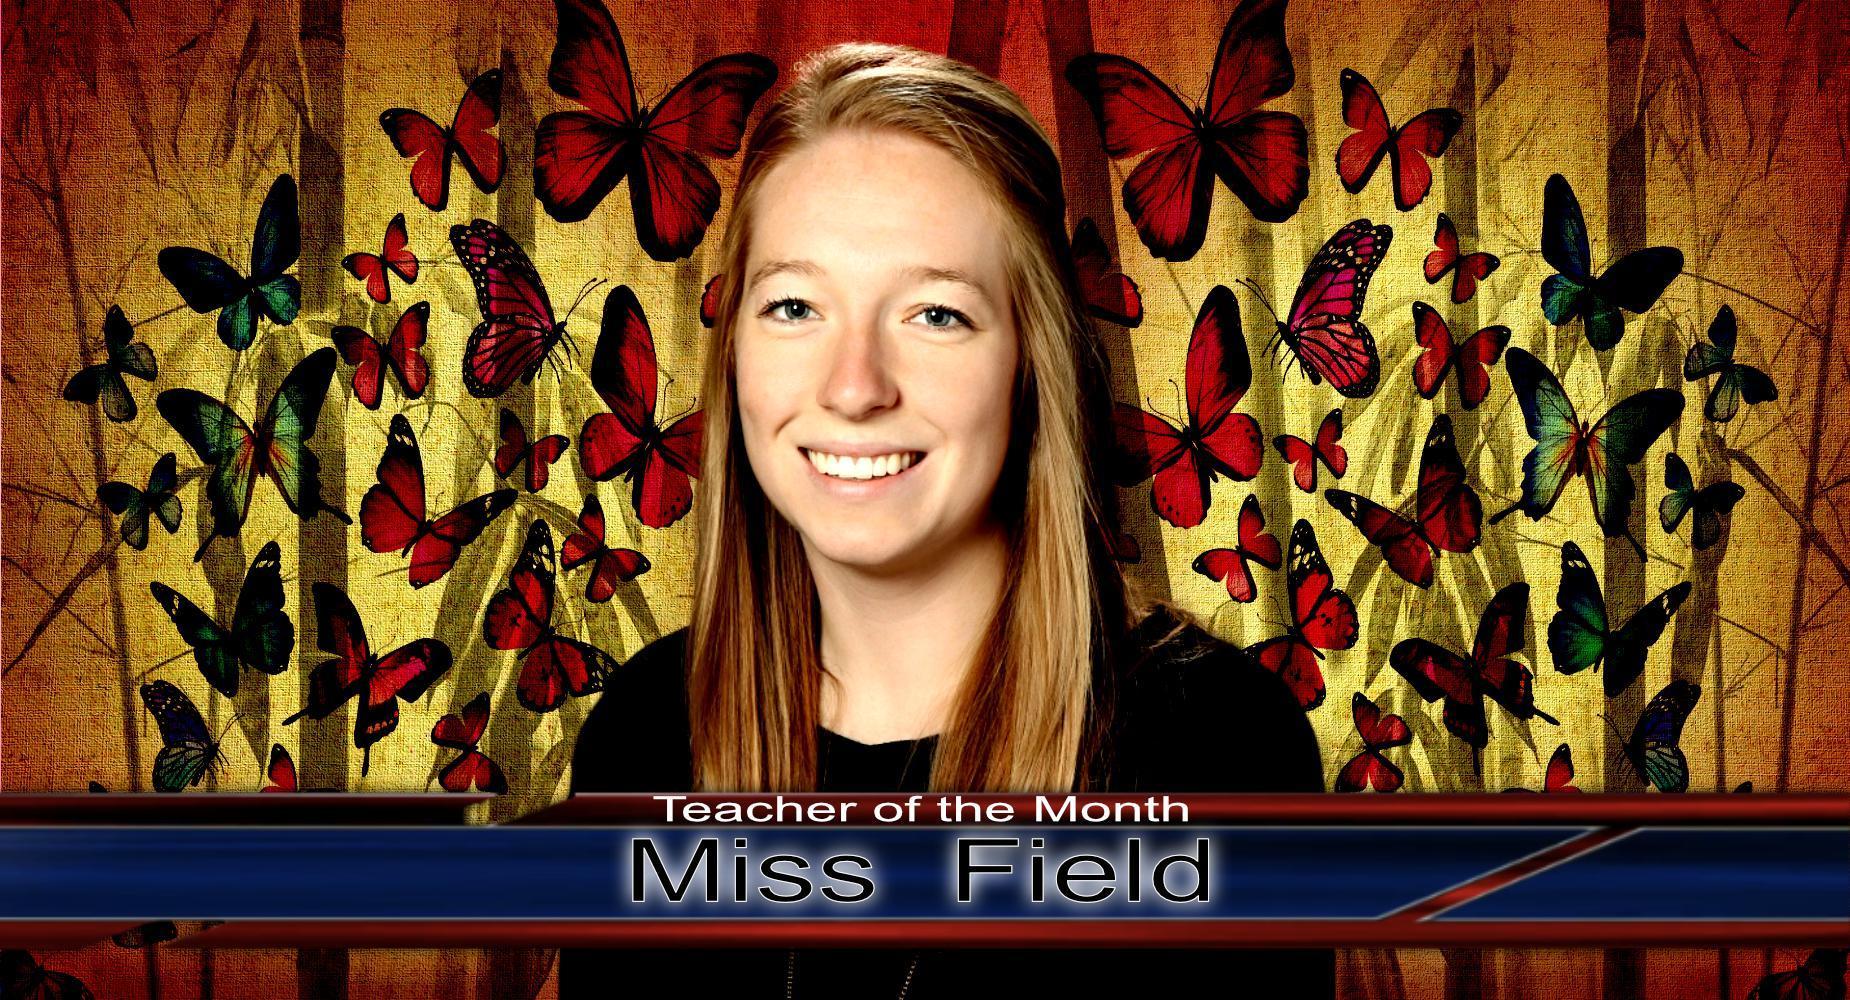 Teacher of the Month - Miss Field